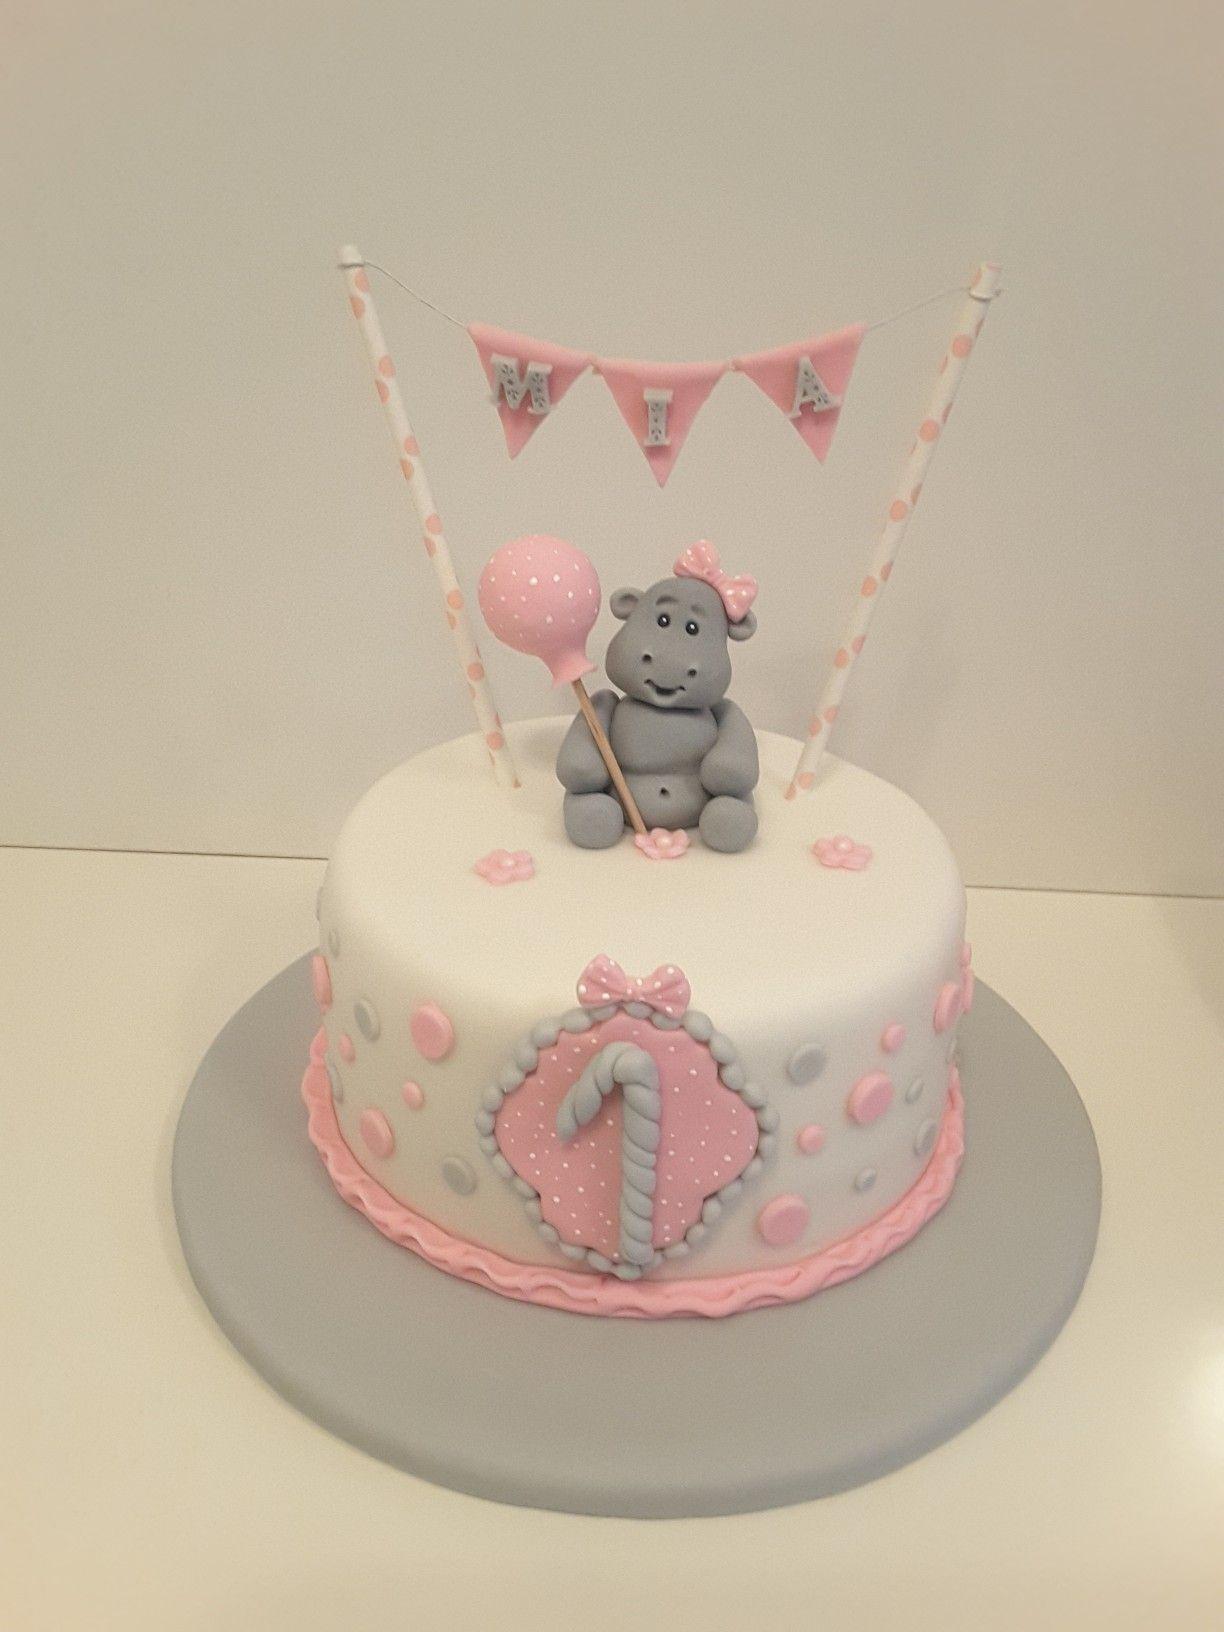 Kindertorte 1 Geburtstag Torten Dekorieren Modellieren